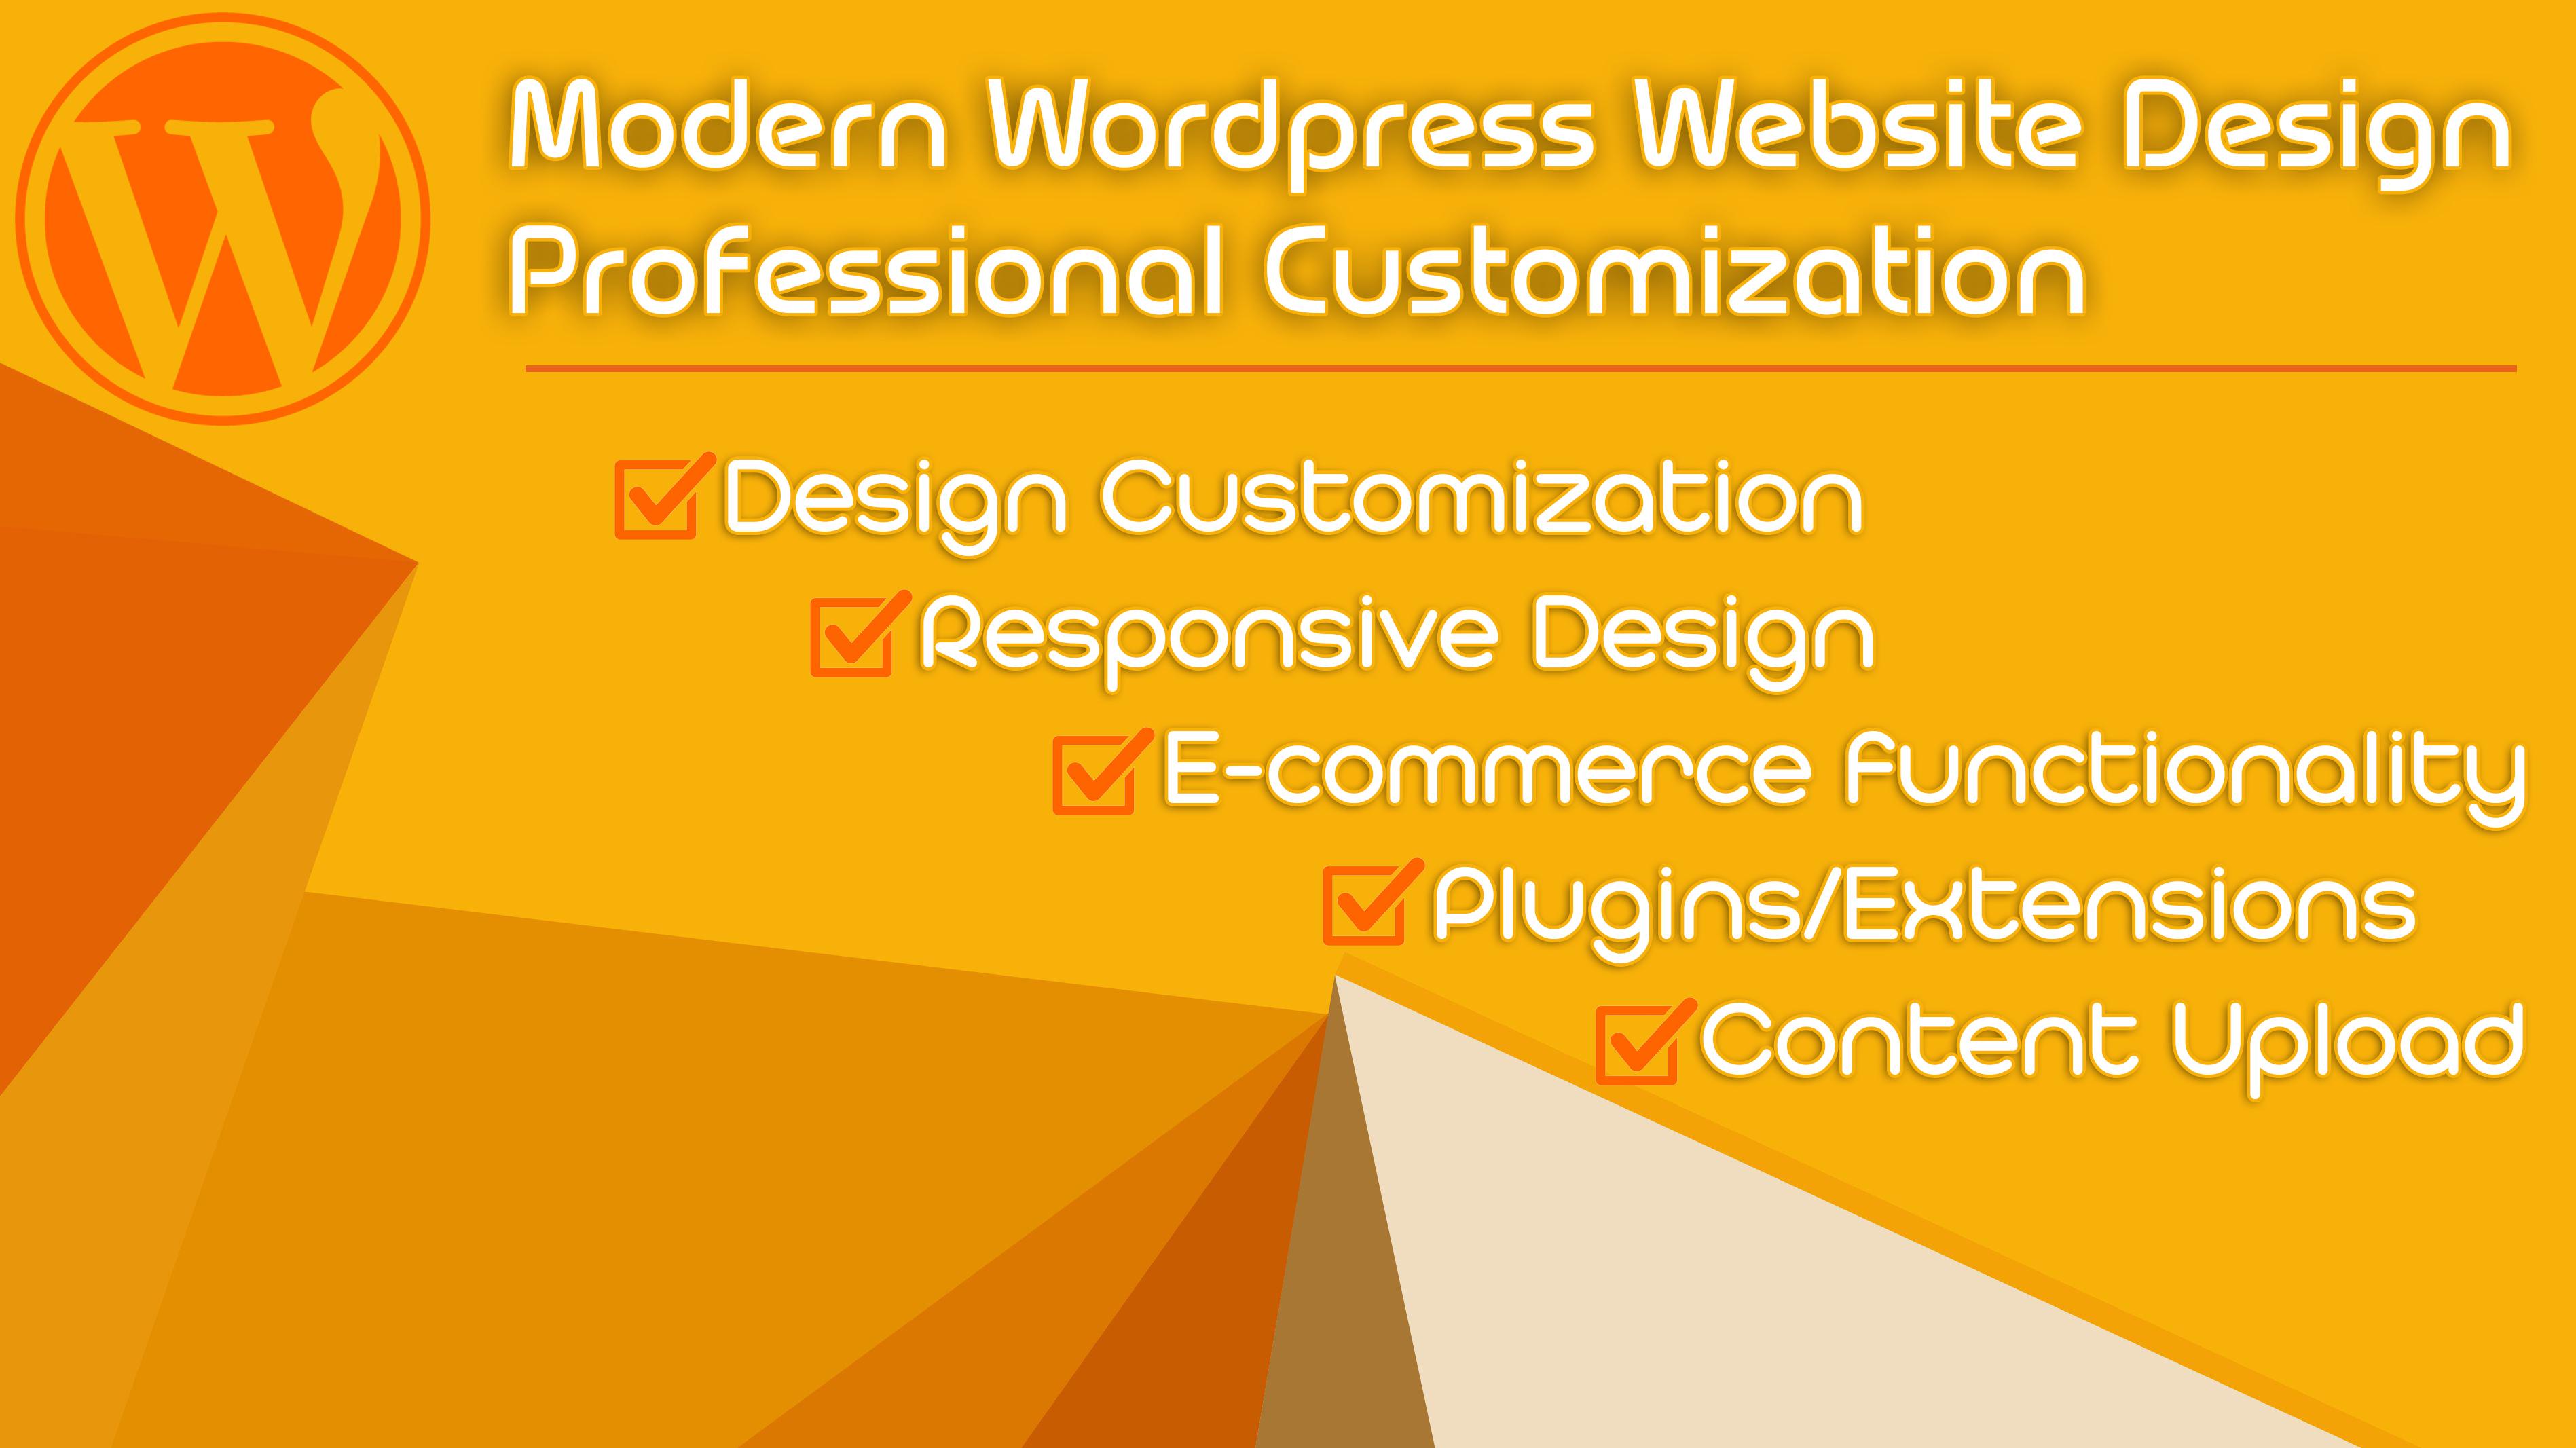 I will design modern wordpress website professional customized